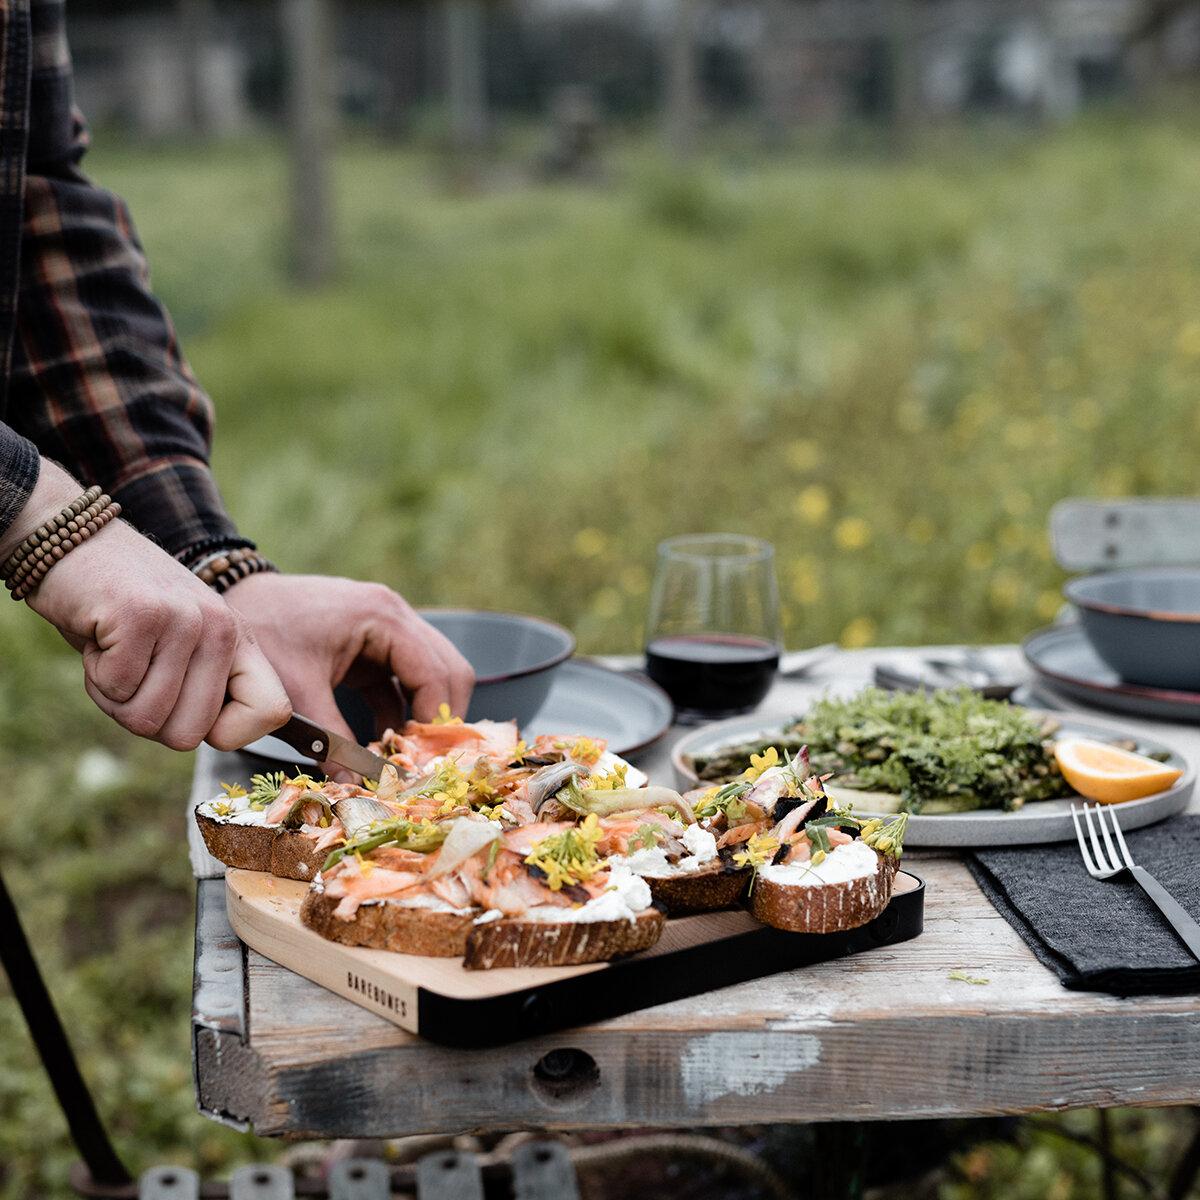 Maple Cutting and Serving Board - Maker: Barebones Living